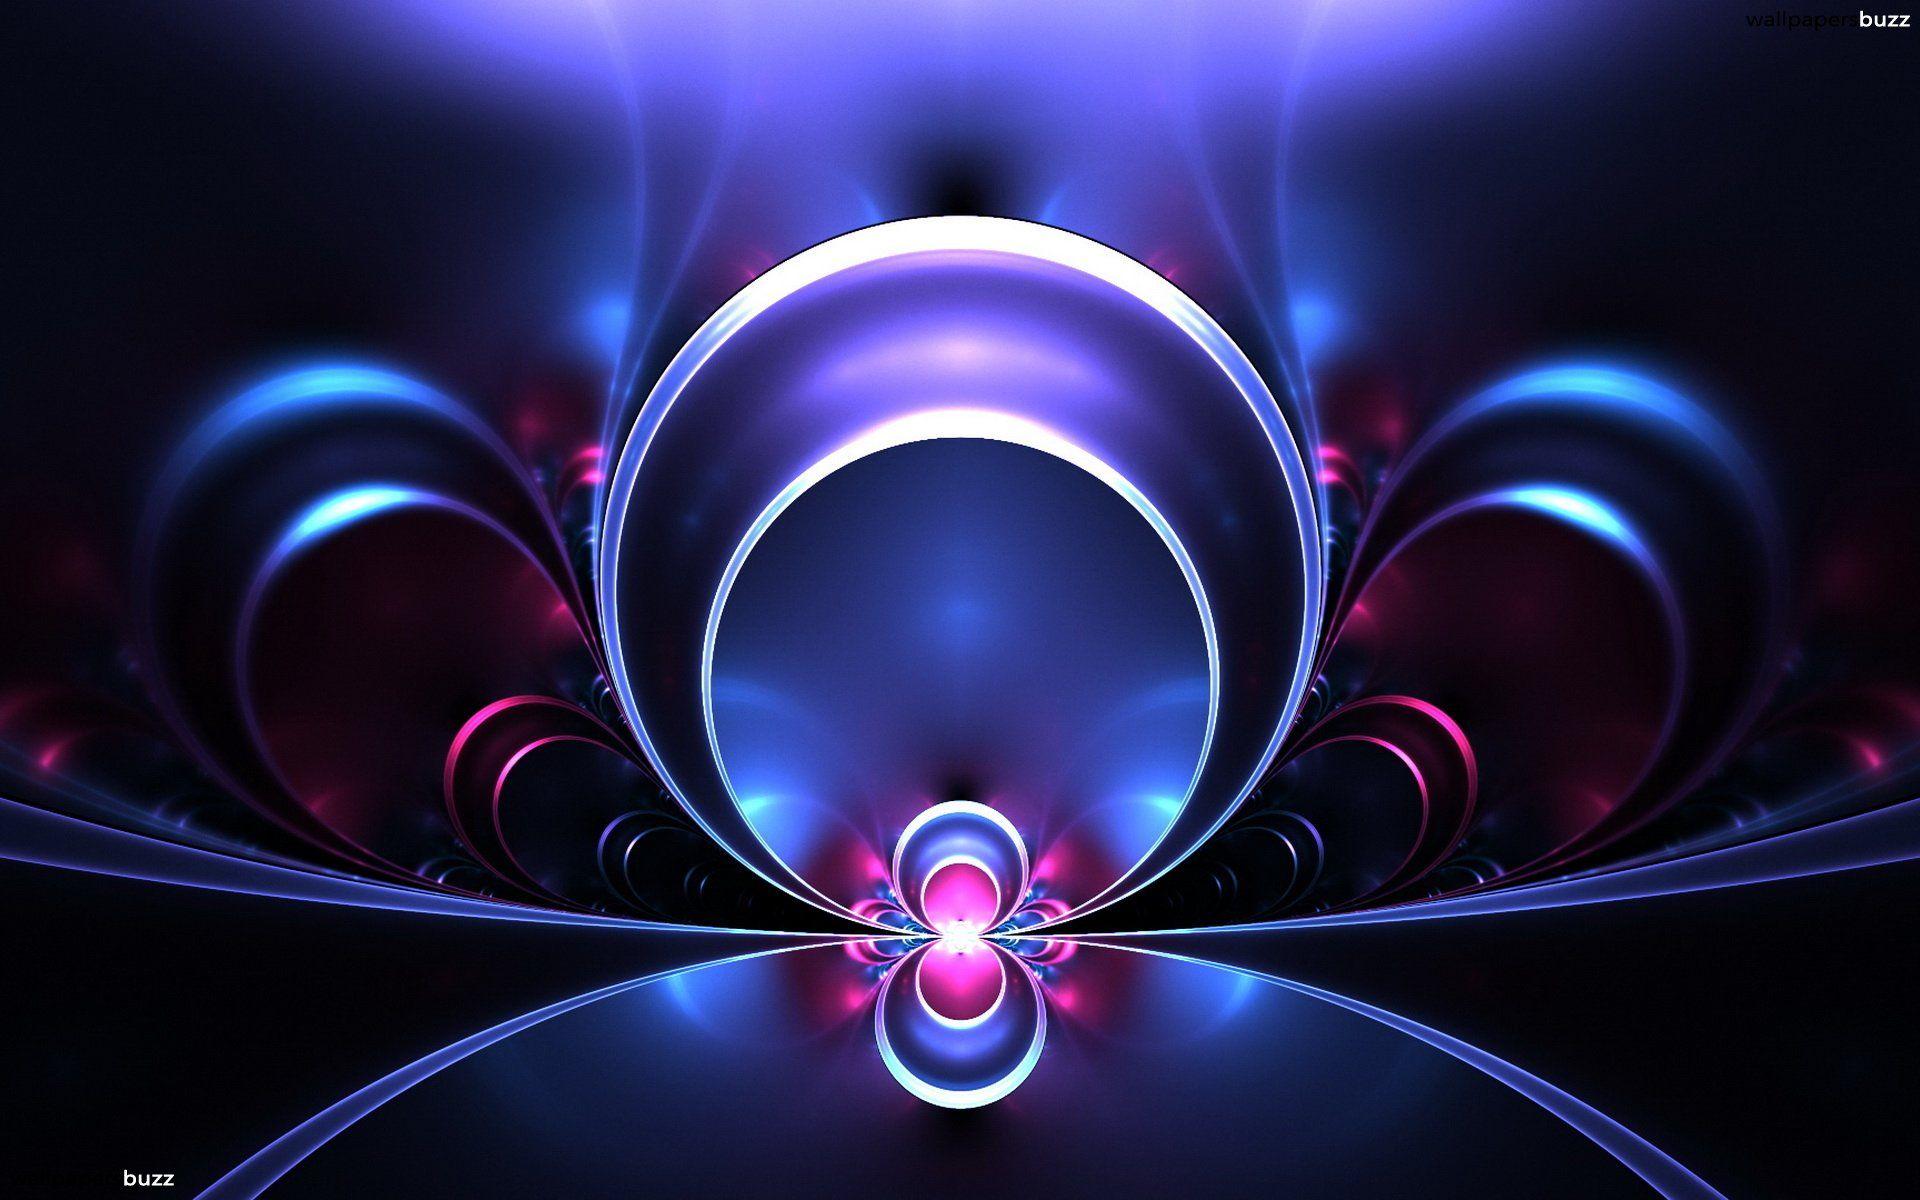 Cool Wallpaper High Resolution Purple - 43eb4cfe7656df0c4a5e509c0a0ade34  Photograph_132674.jpg